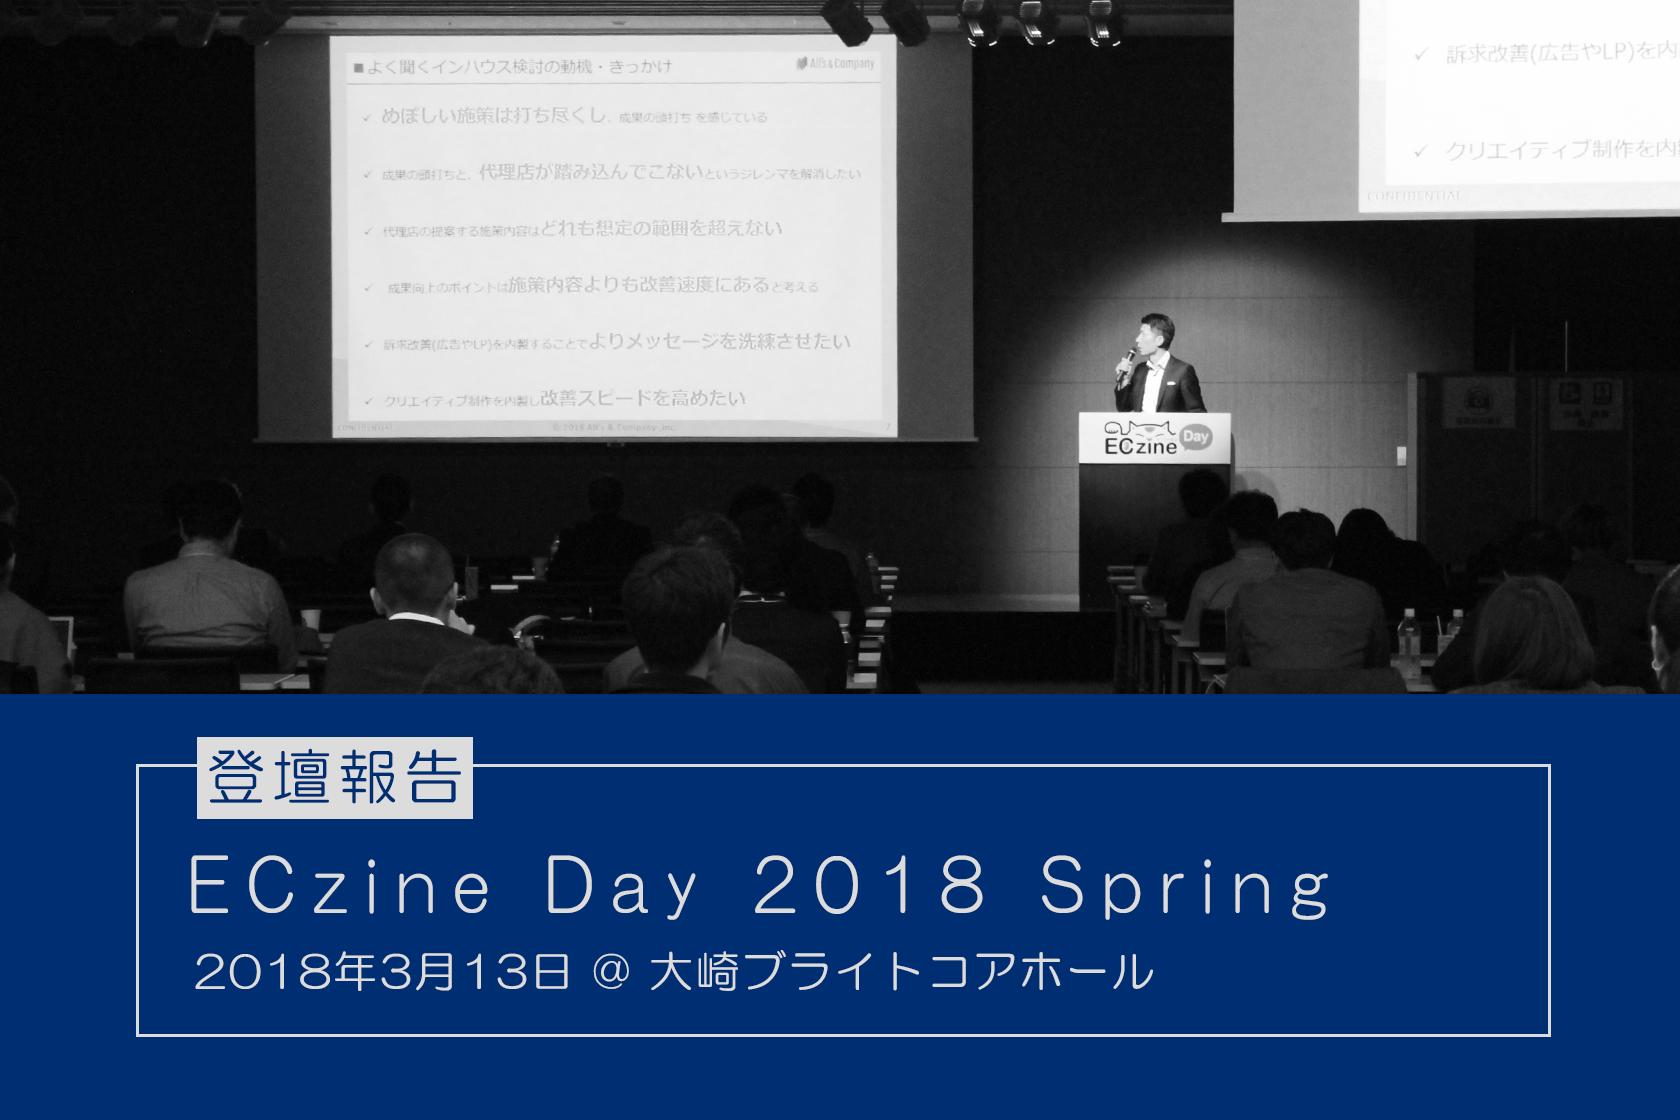 『ECzine Day 2018 Spring』に登壇しました